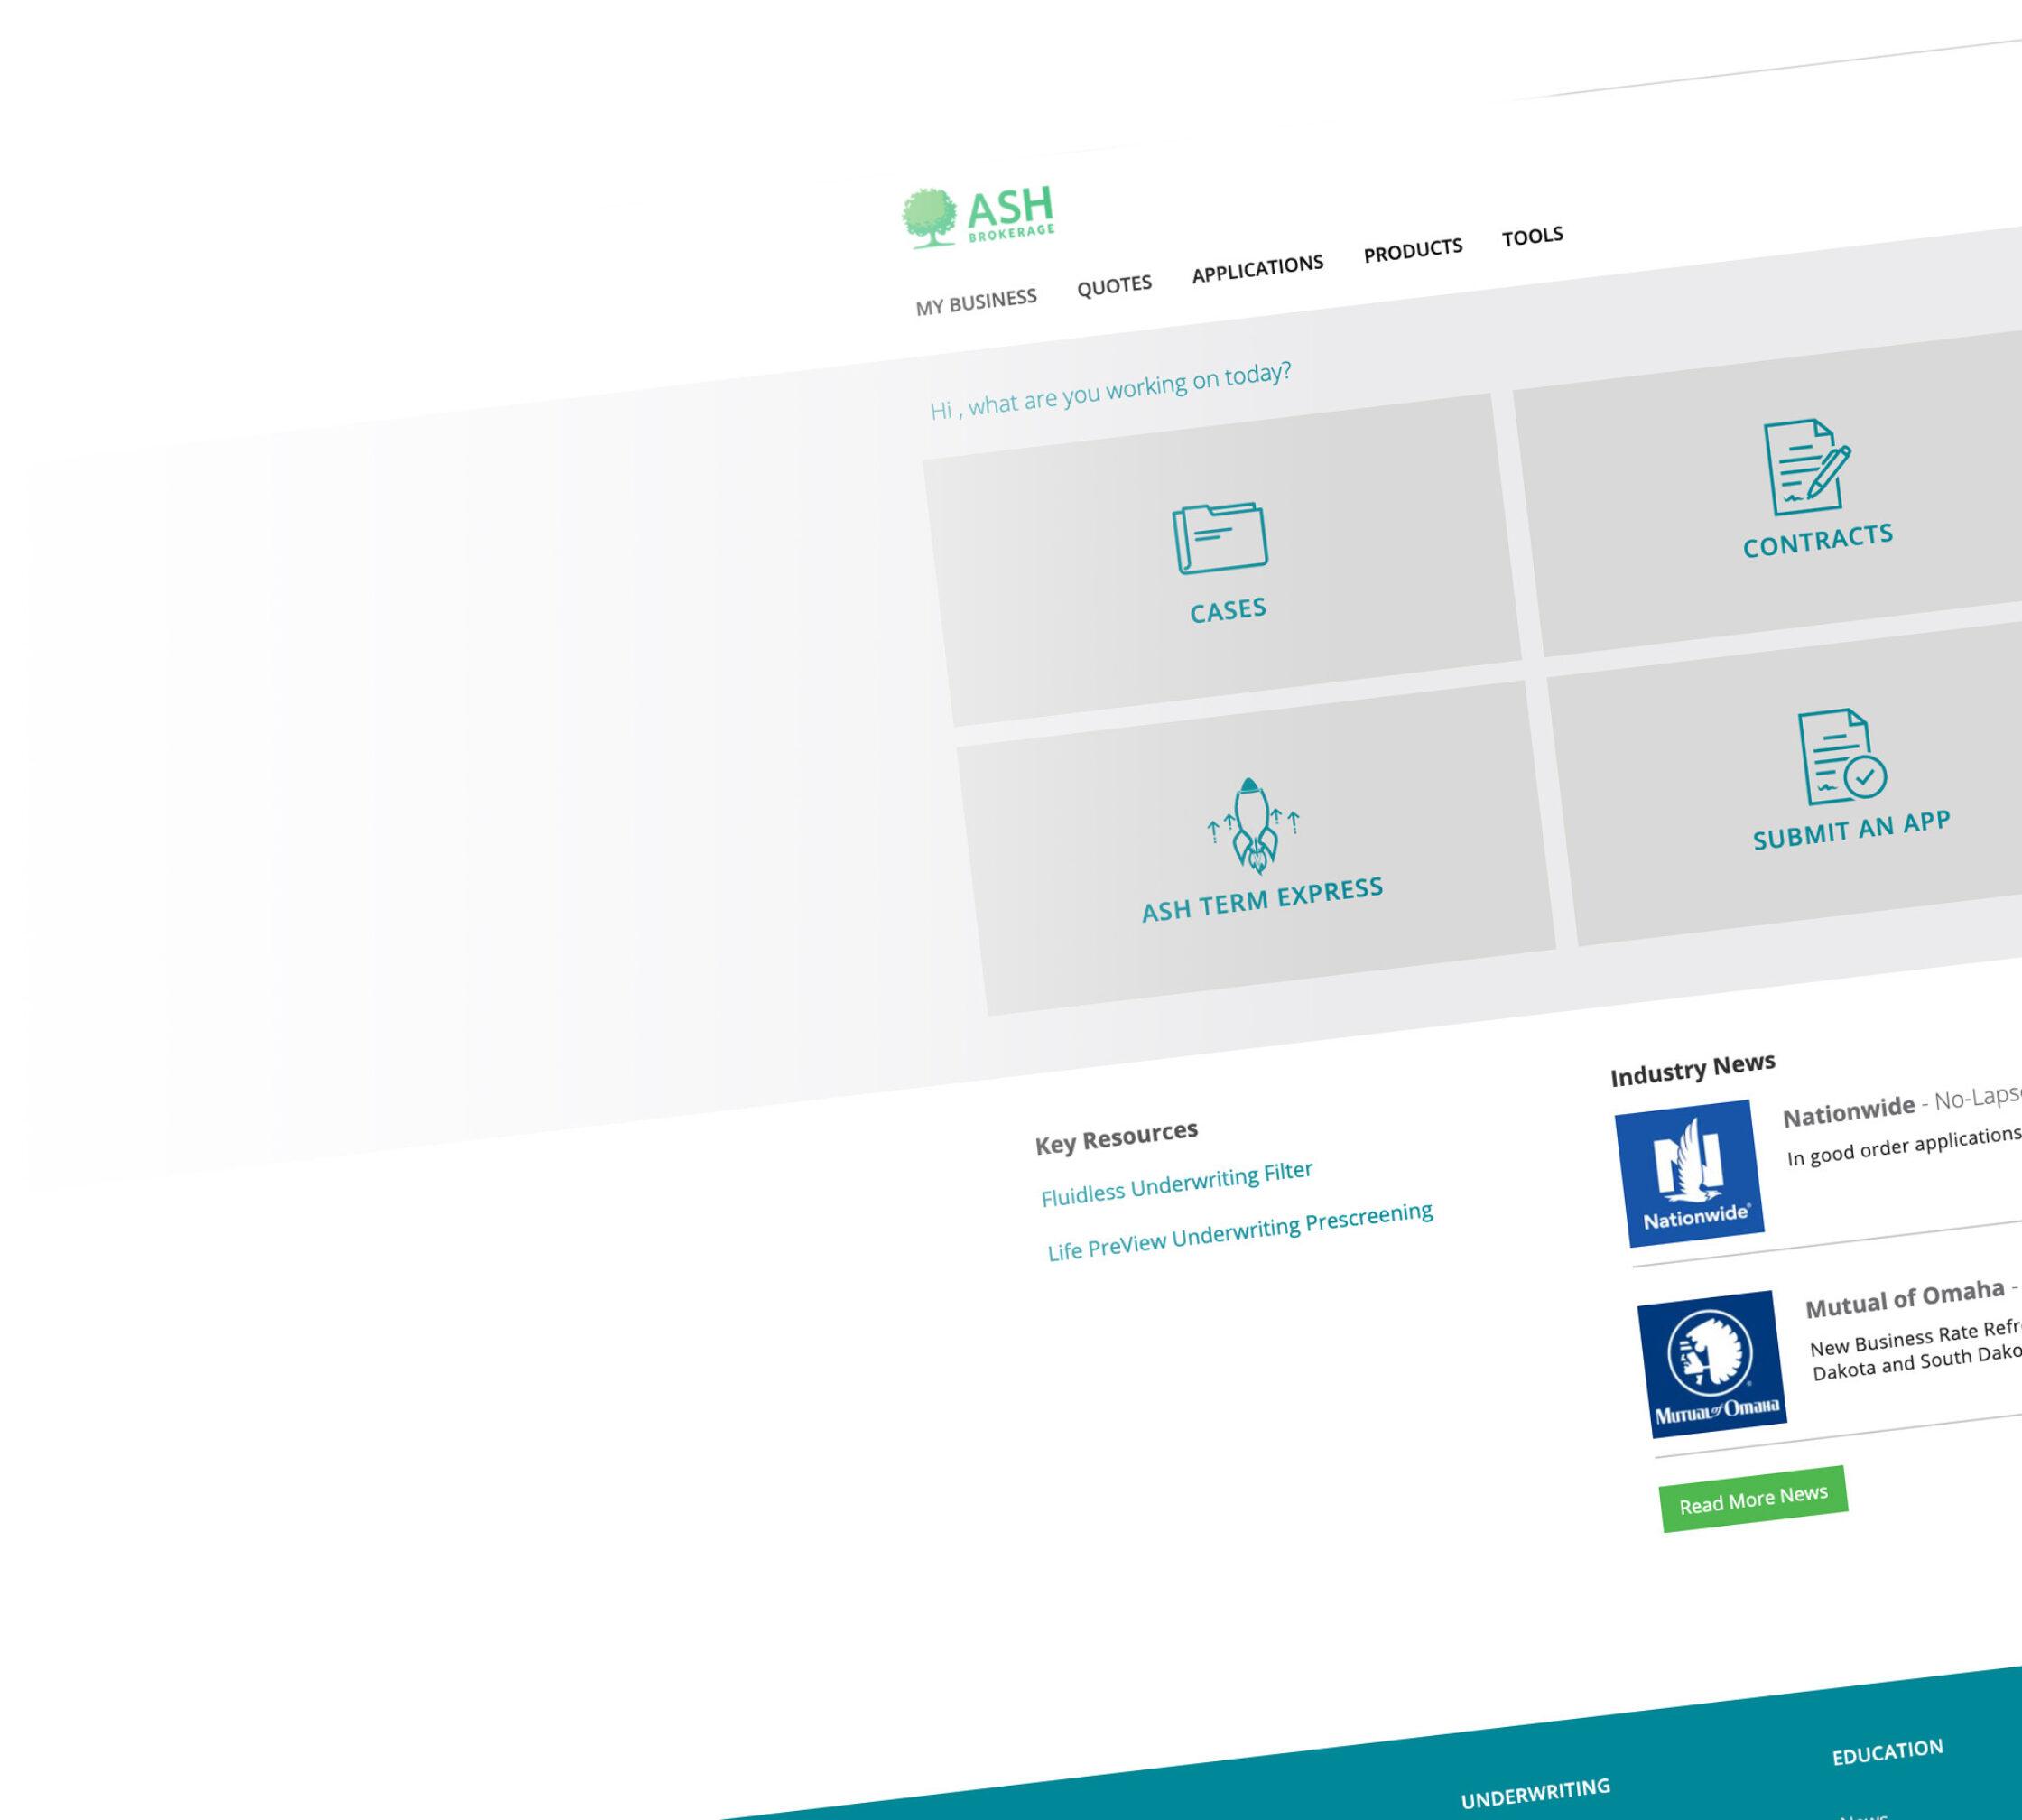 Ash Brokerage Advisor Portal Homepage 2